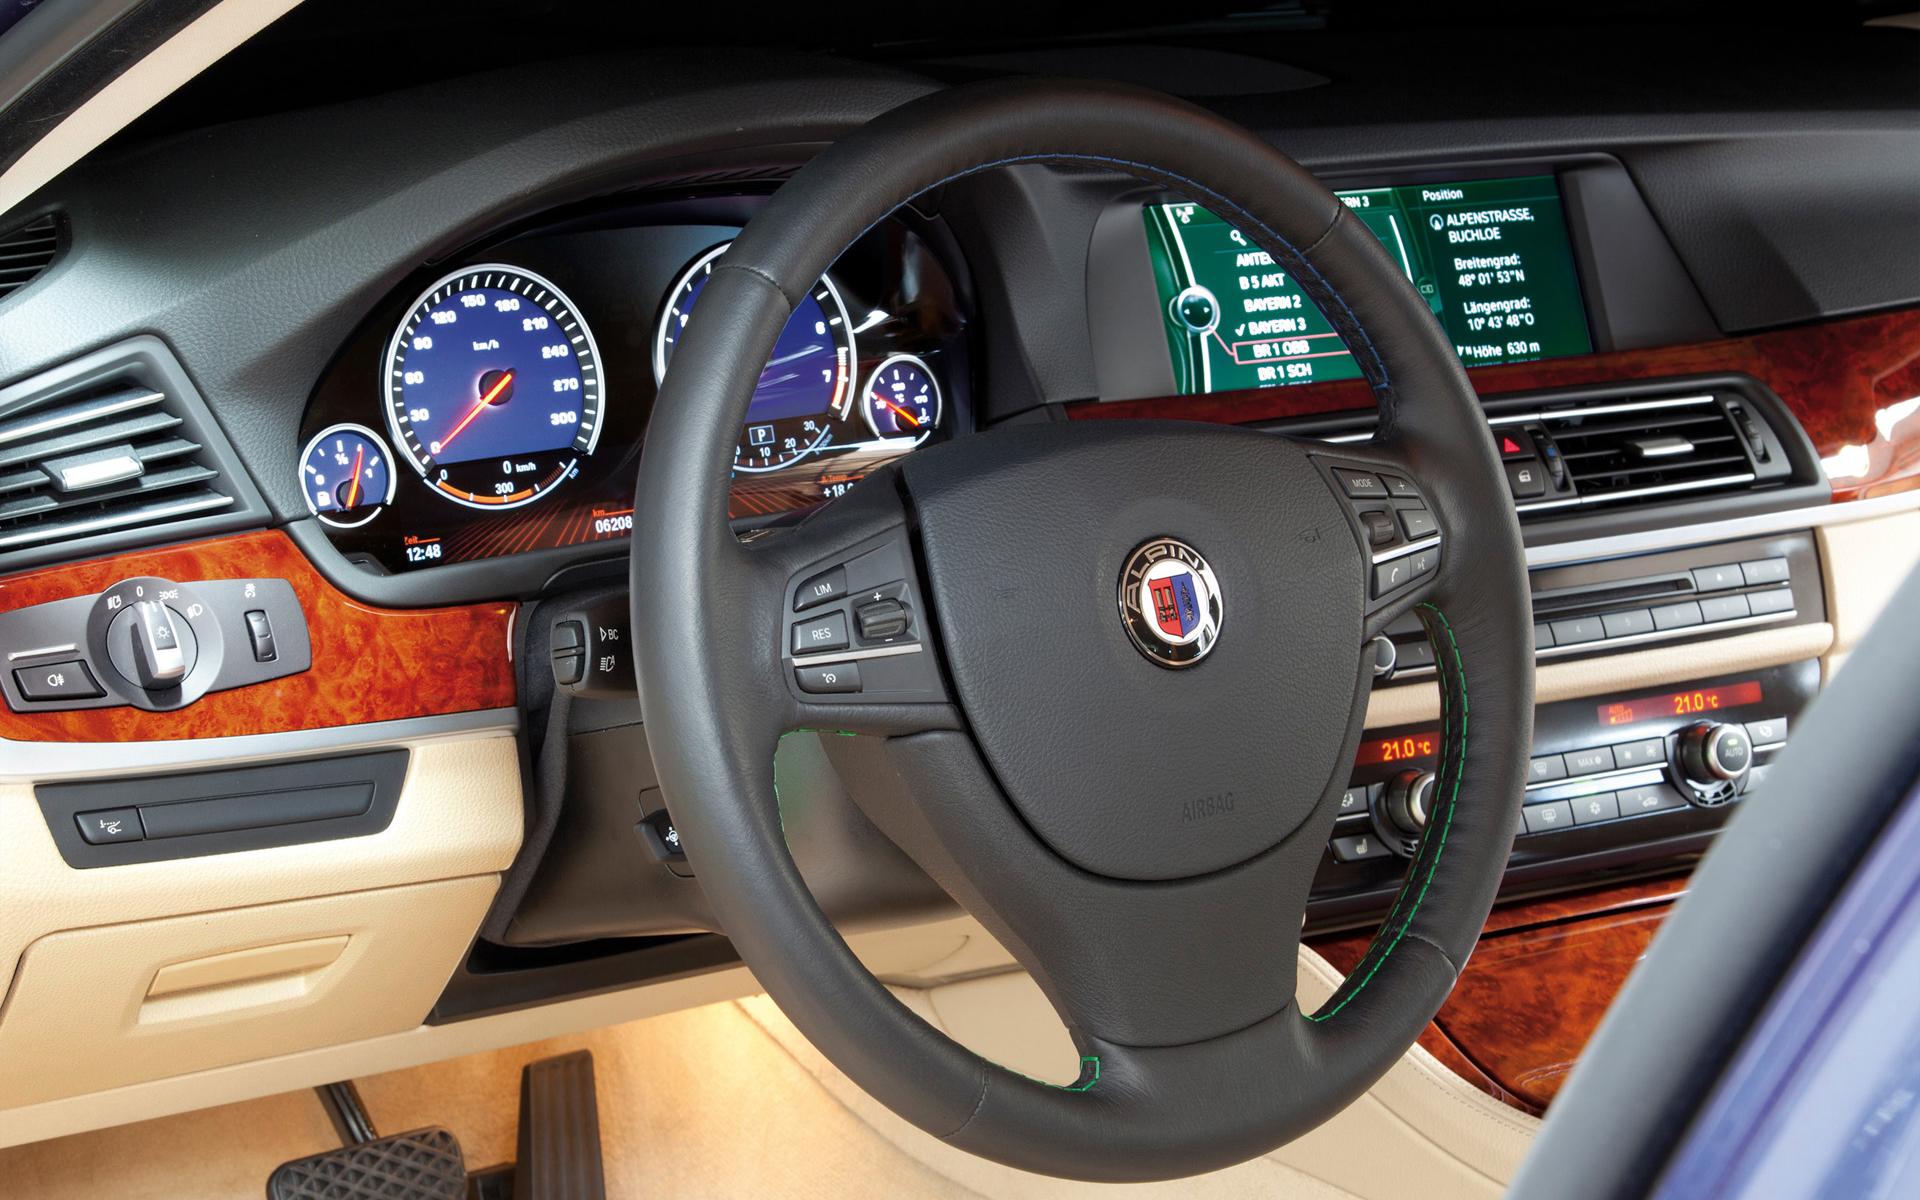 2011-BMW-Alpina-B5-Biturbo-Dashboard-1920x1440